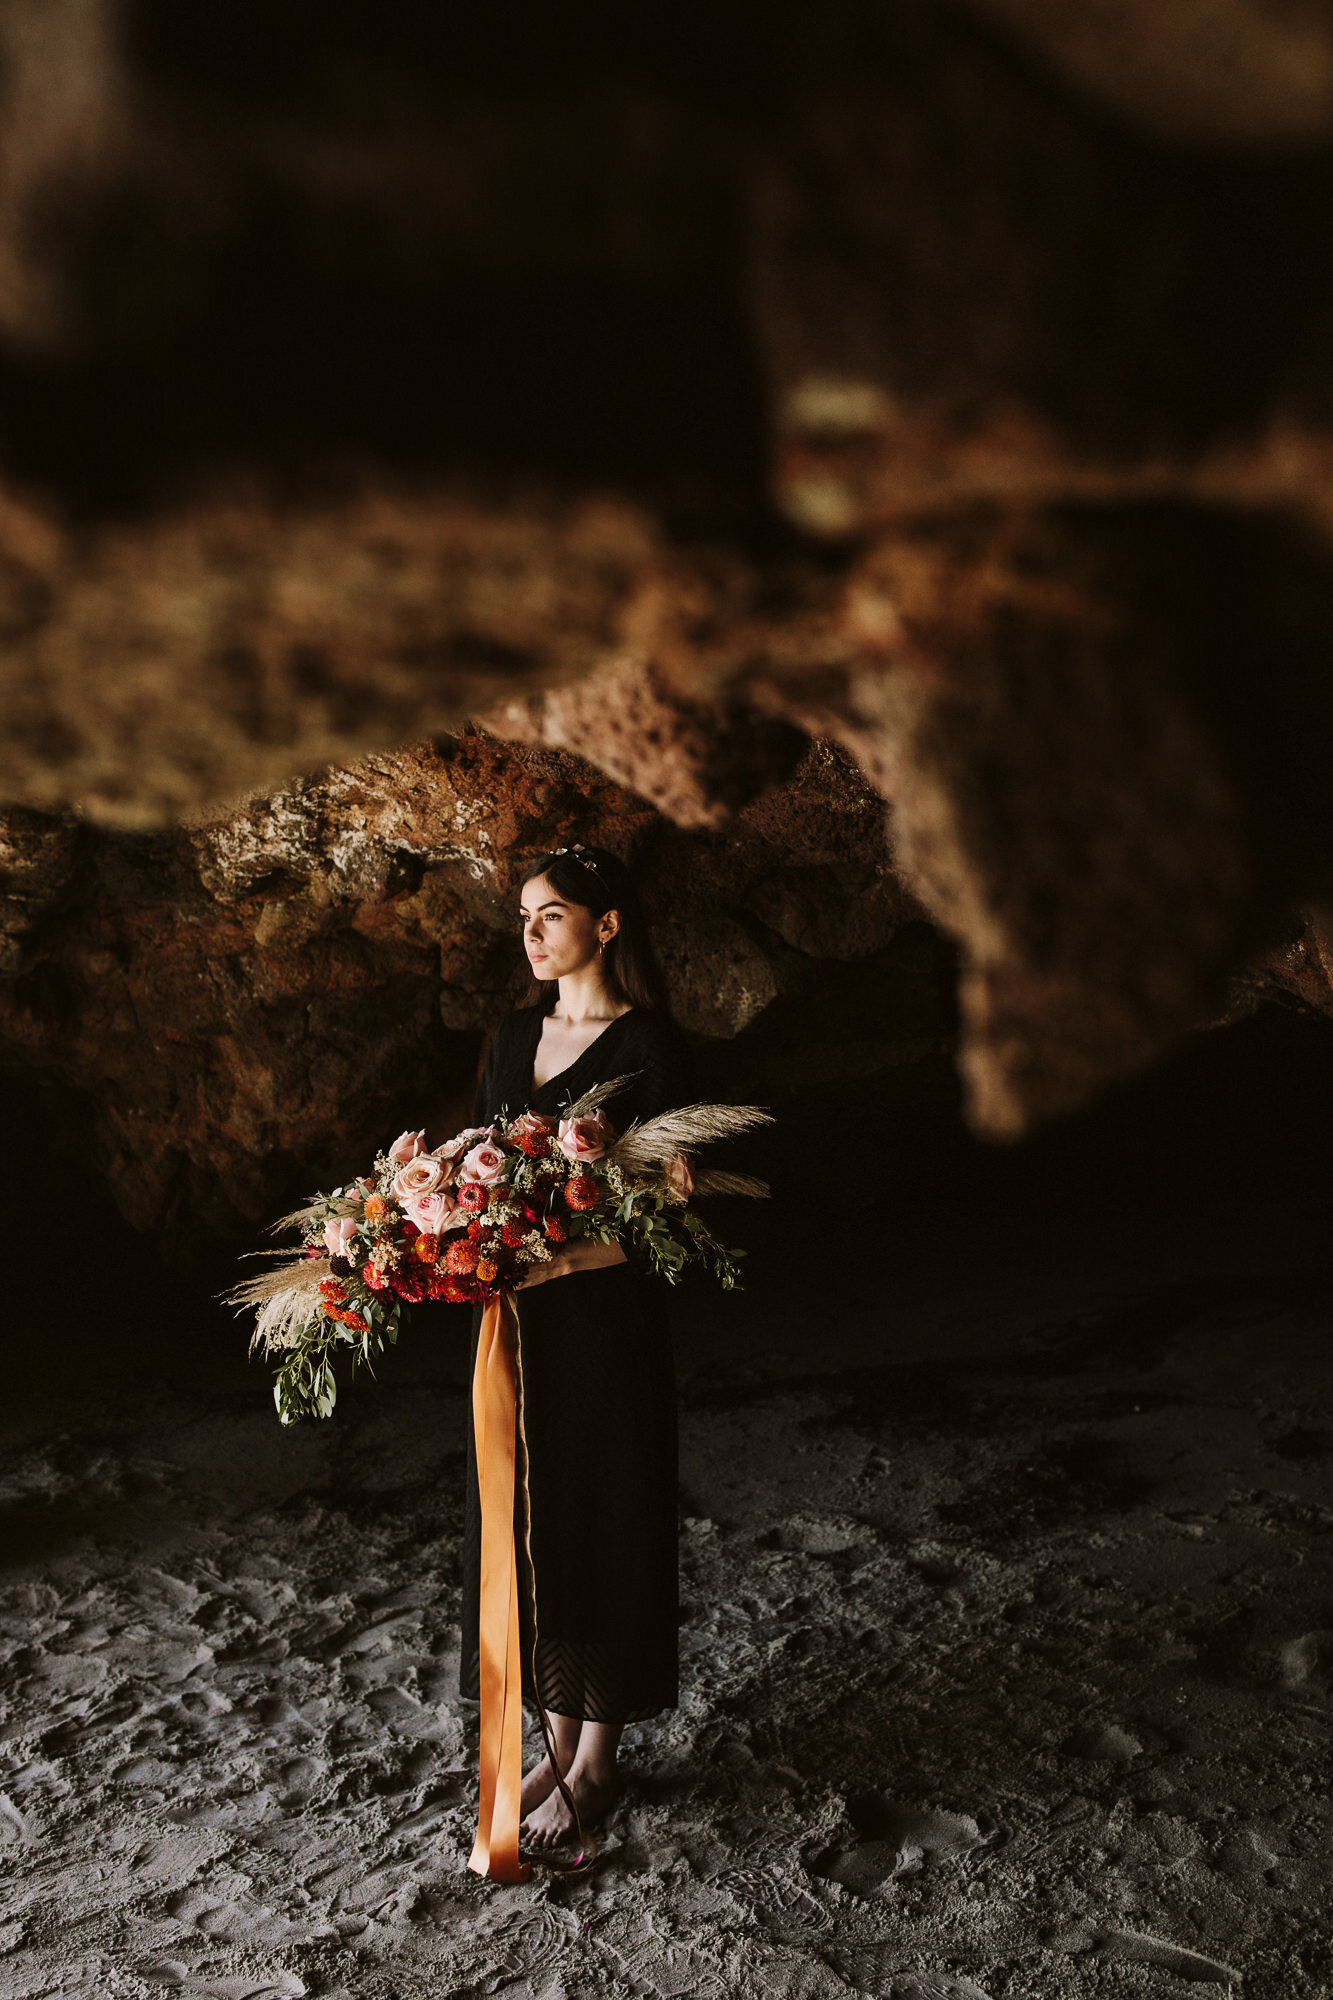 ELOPING_IN_CALIFORNIA_ALFONSO_FLORES_DESTINATION_WEDDING_PHOTOGRAPHY-18.jpg